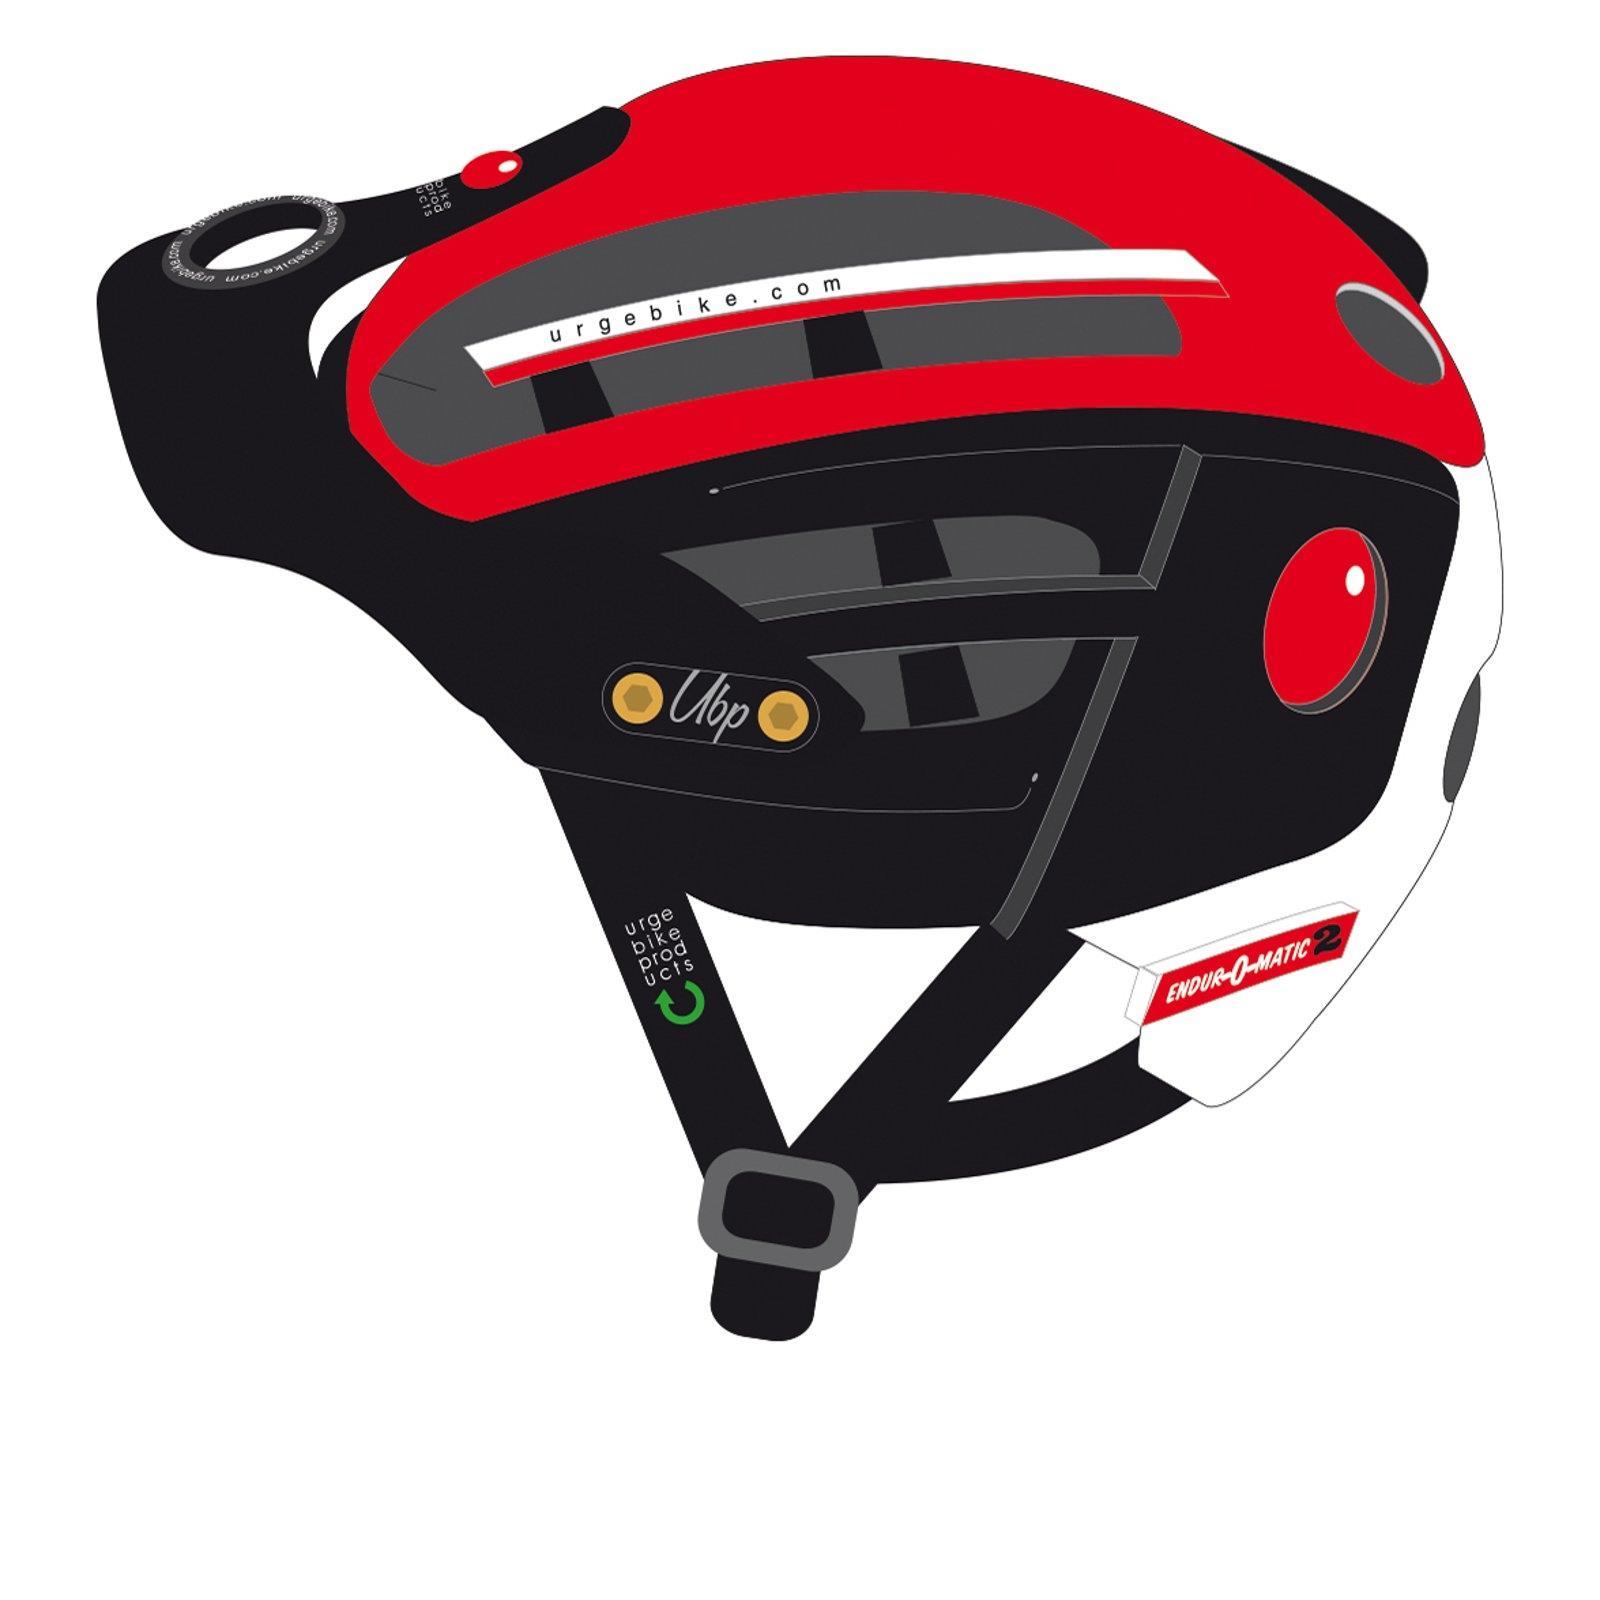 Urge Endur-o-matic 2 Fahrrad Fahrrad Fahrrad Enduro Helm All Mountain Bike DIRT XC MTB komfort add862